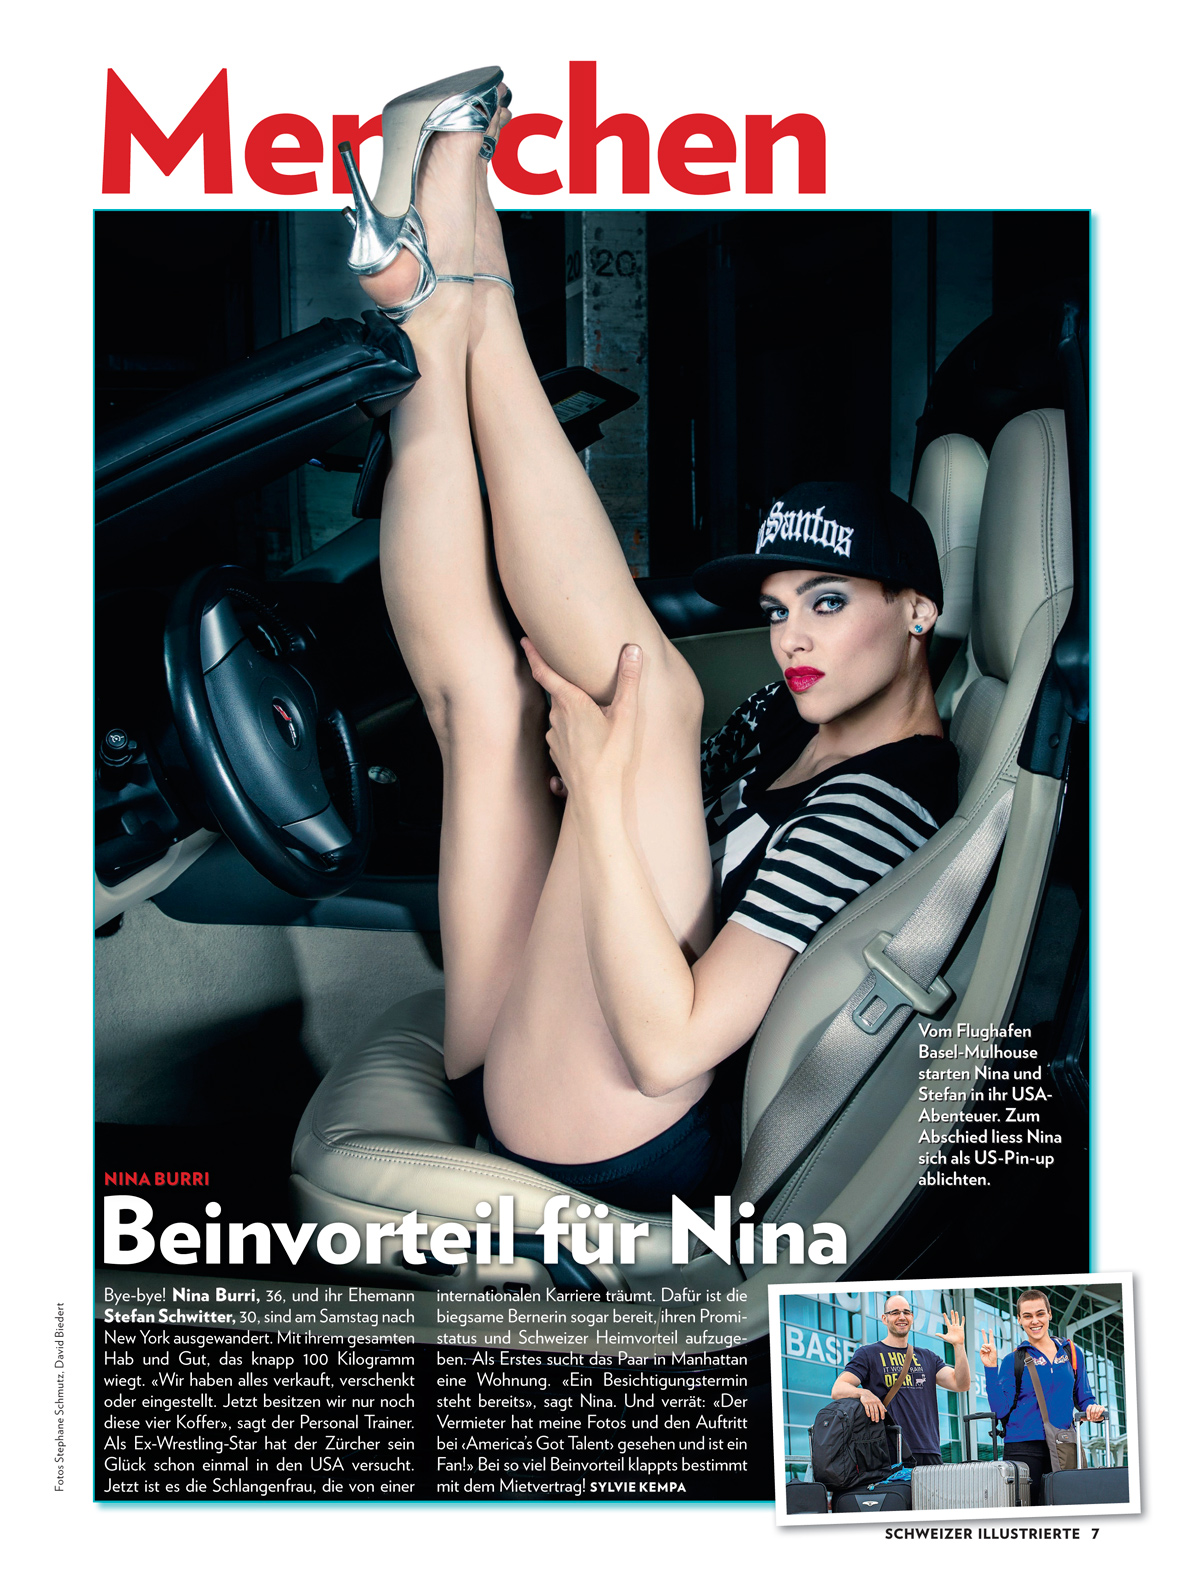 Publication of full page image of Nina Burri in Swiss Magazine SCHWEIZER ILLUSTRIERTE